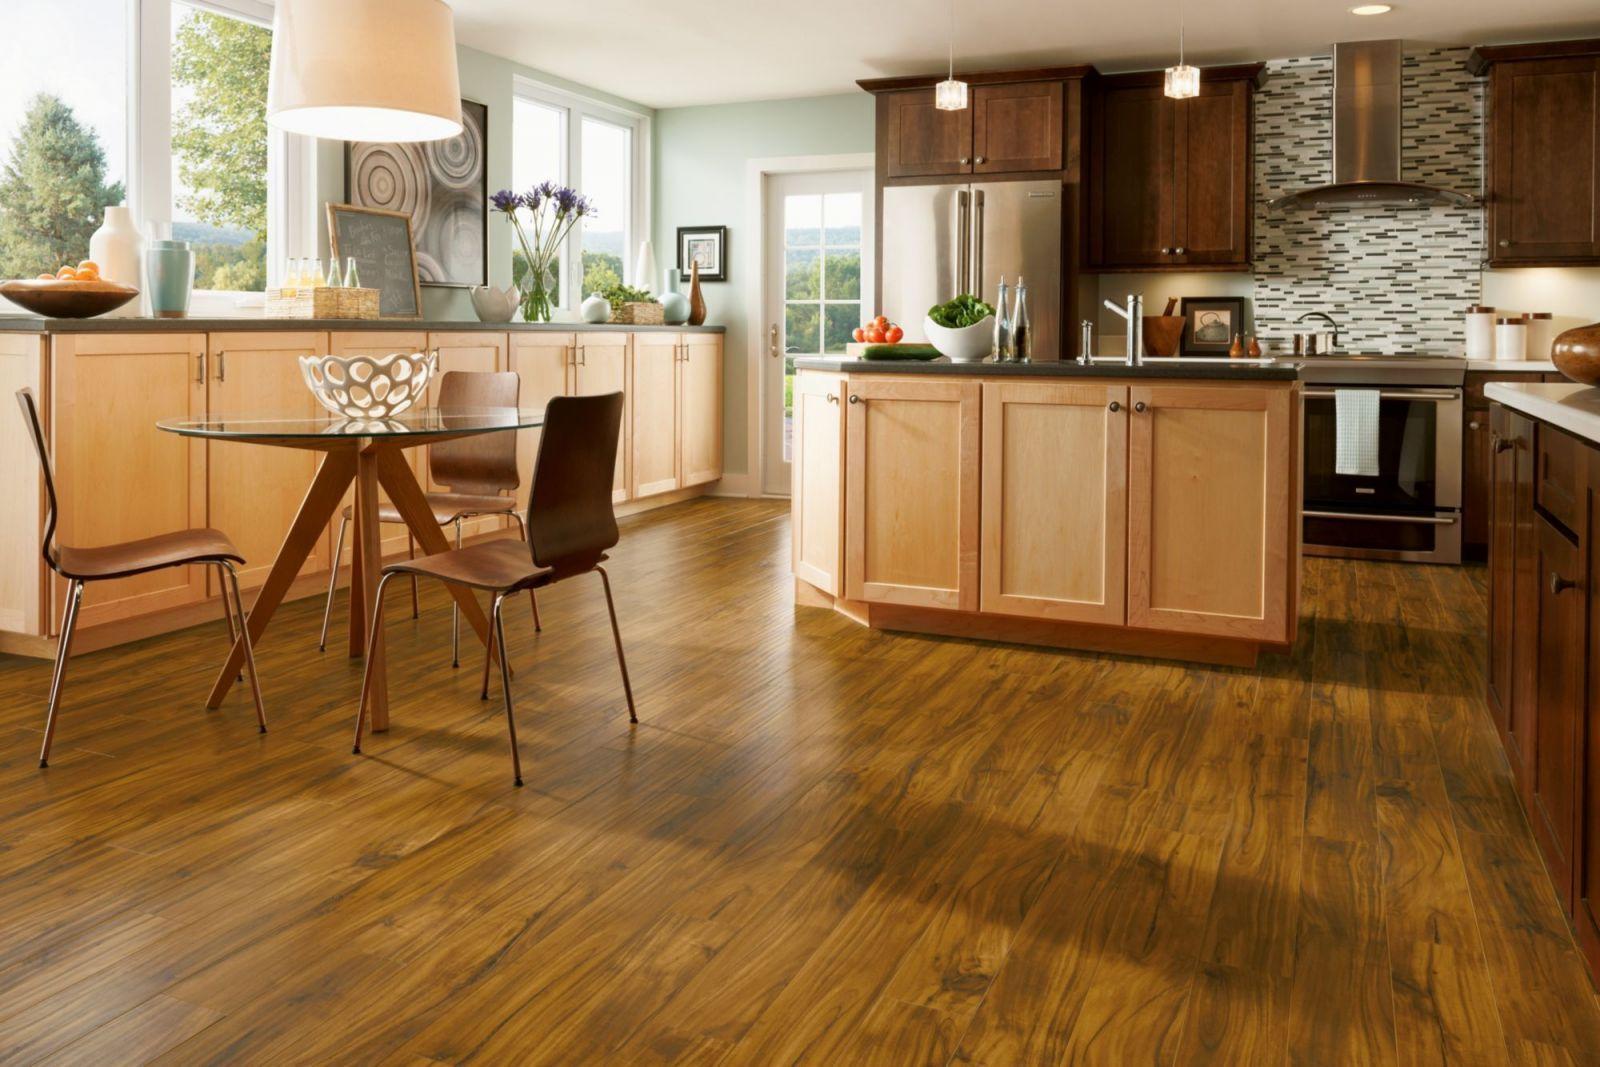 Armstrong Pryzm Native Acacia Golden Hybrid Floor W Rigid Core 6mm X 6 X 48 Laminate Flooring In Kitchen Hardwood Floors In Kitchen Wooden Kitchen Cabinets